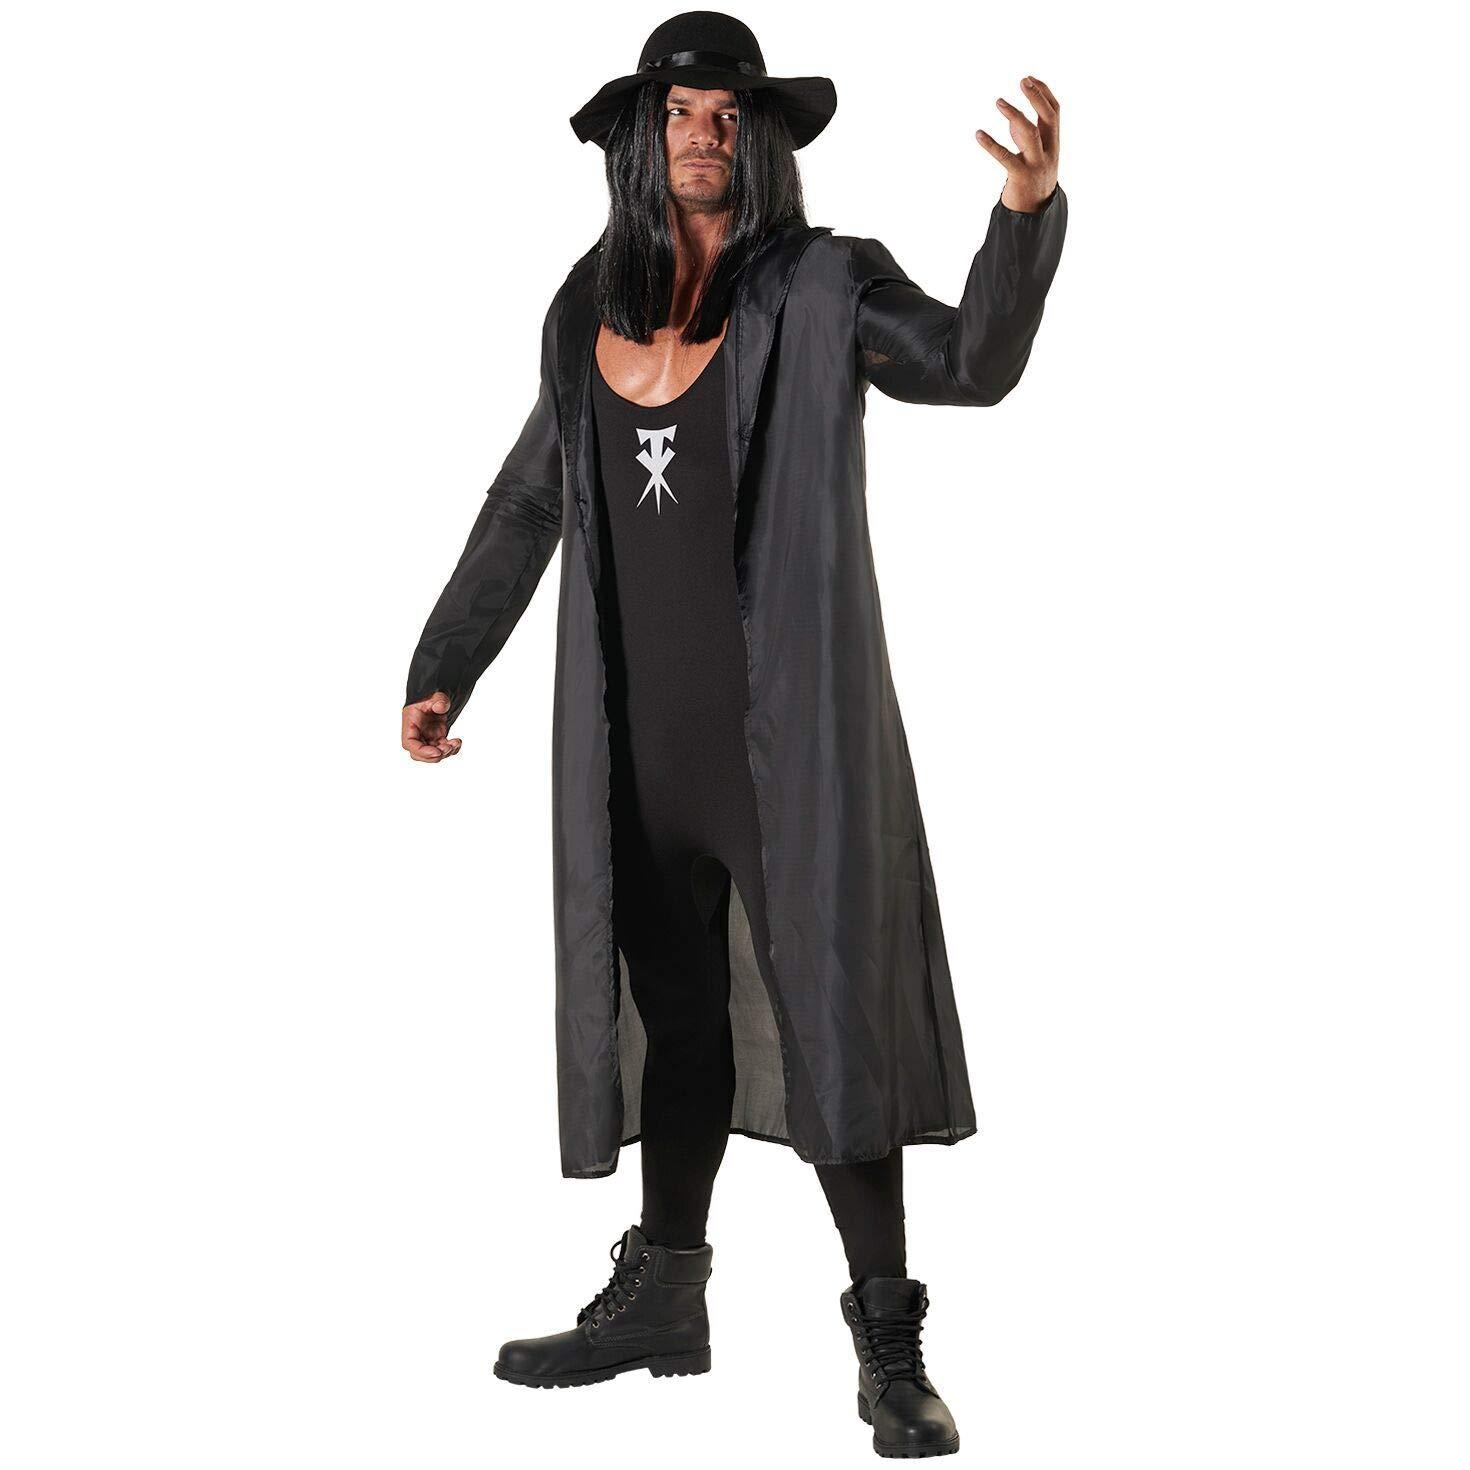 Morph Licenza Classic WWE Finn Balor Il Demone Adulti